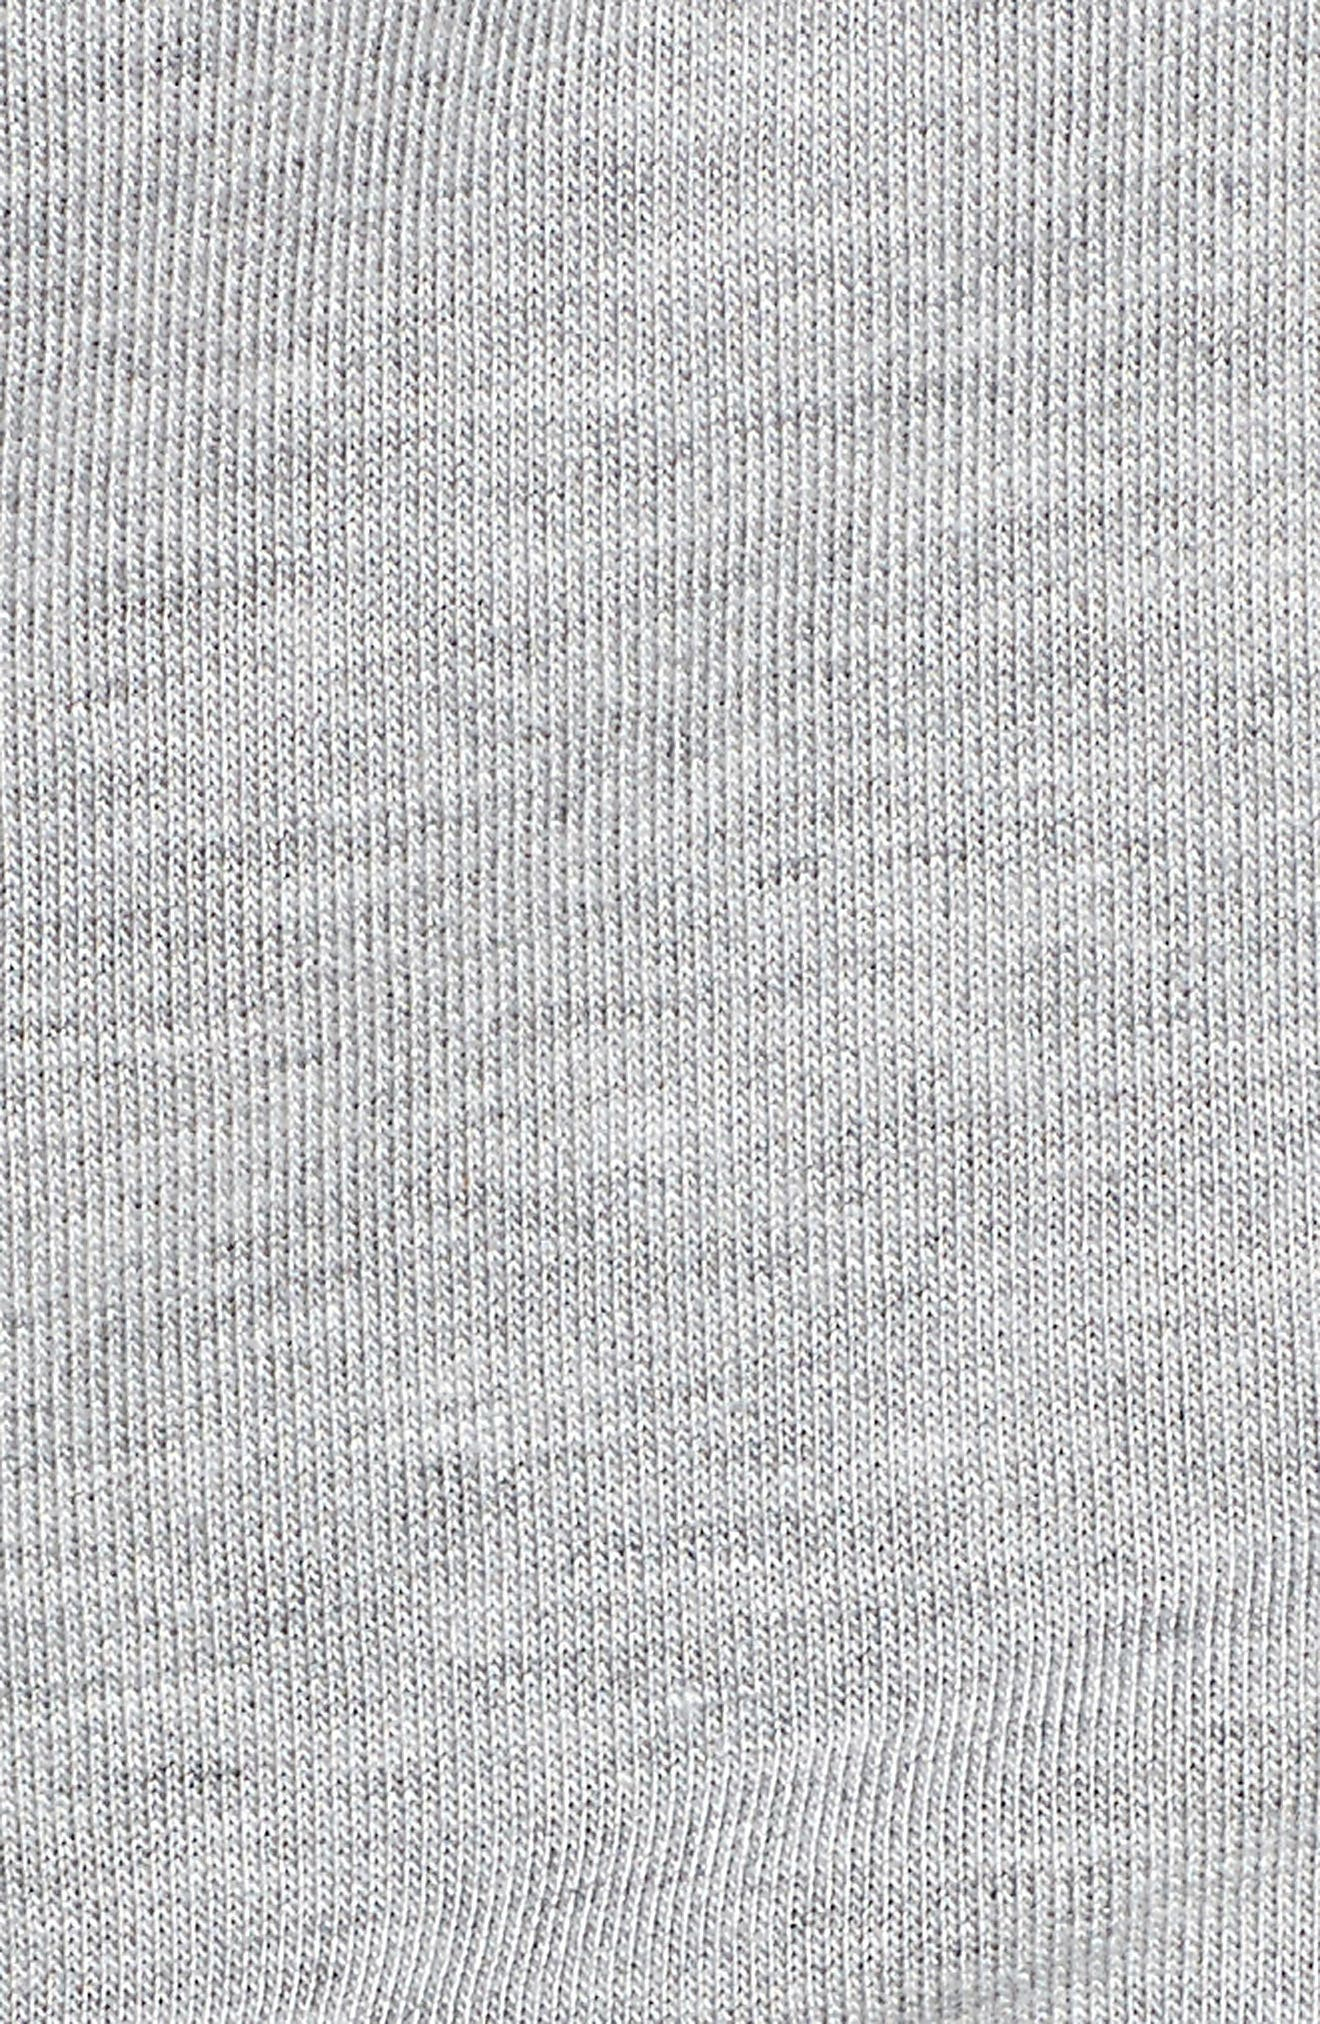 Pajama Shorts,                             Alternate thumbnail 5, color,                             LIGHT HEATHER GREY